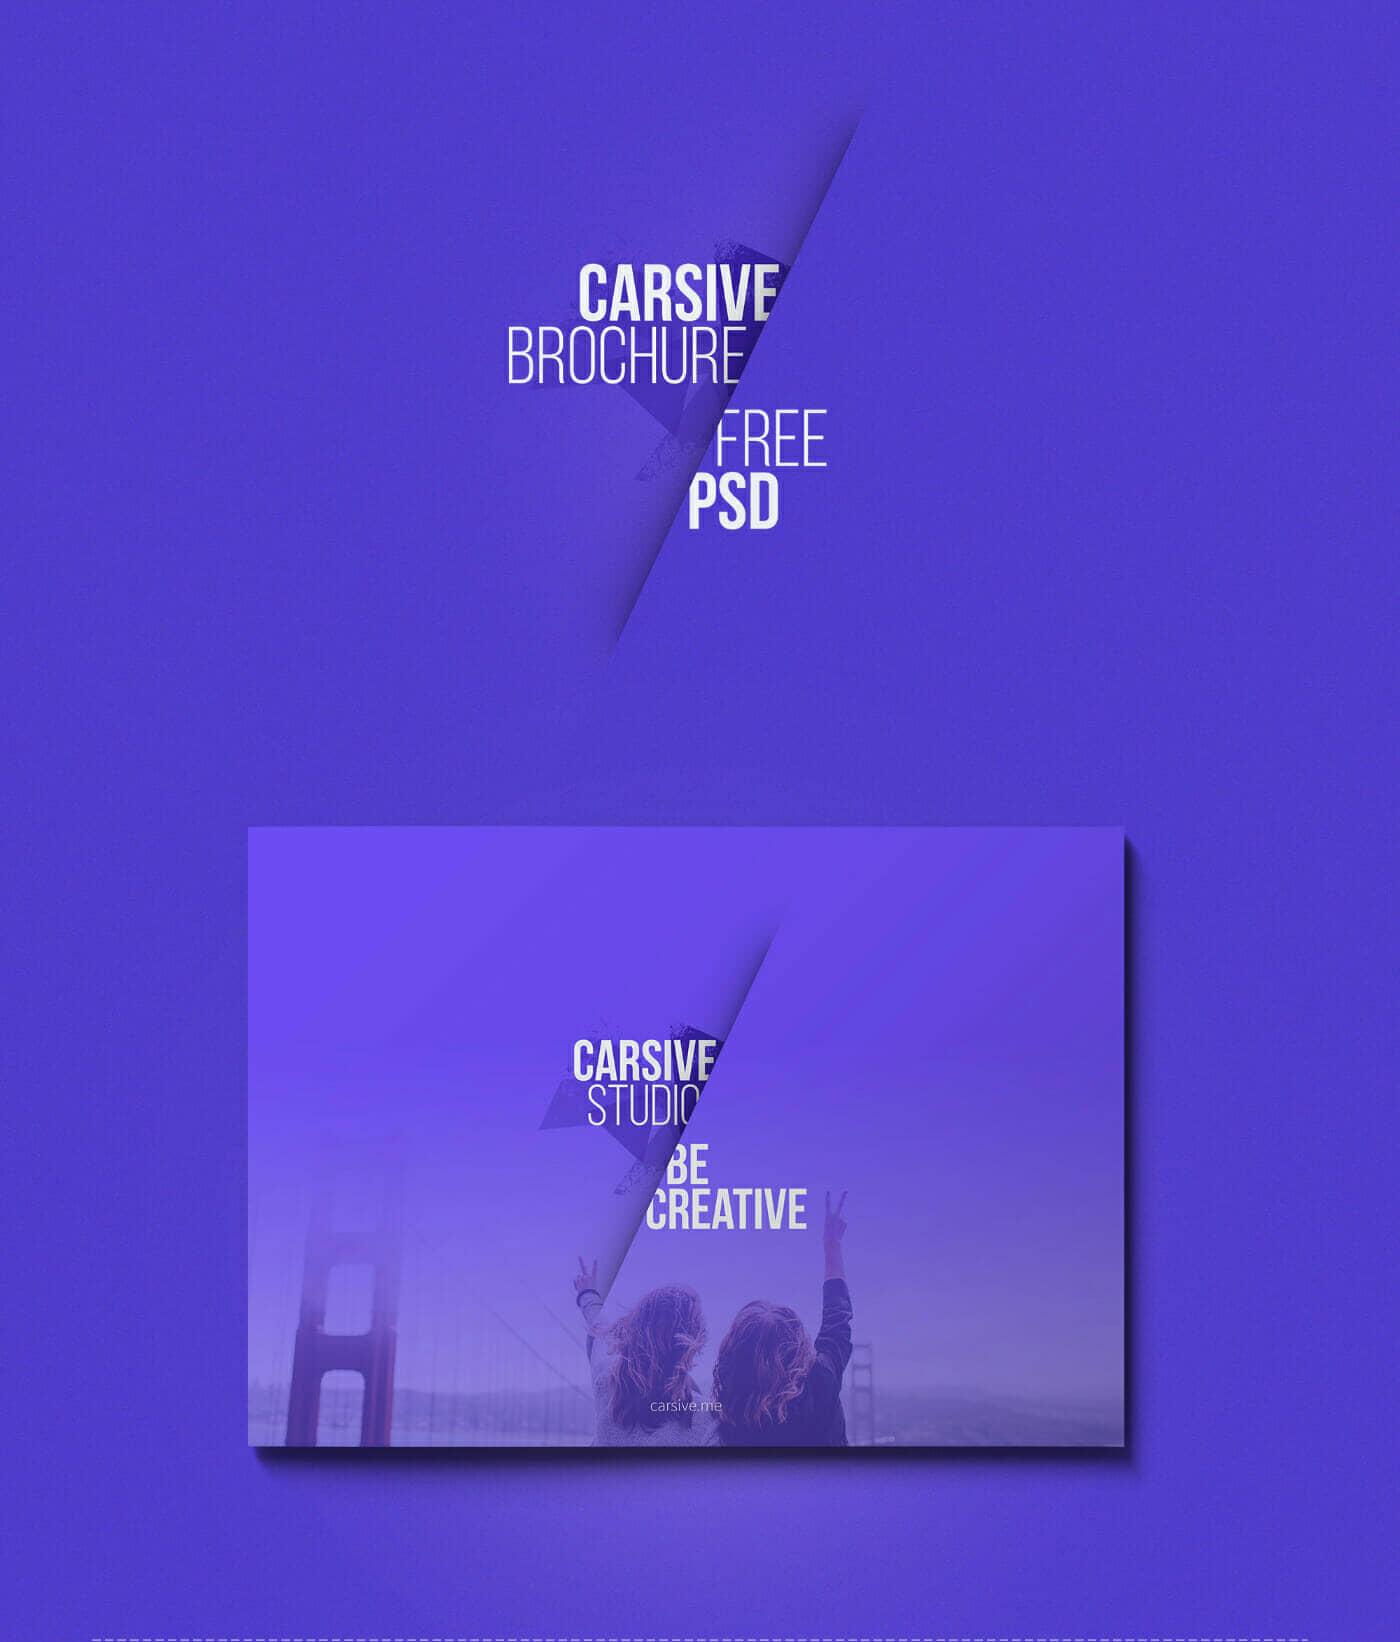 Carsive - 18 Pages Brochure Freebie